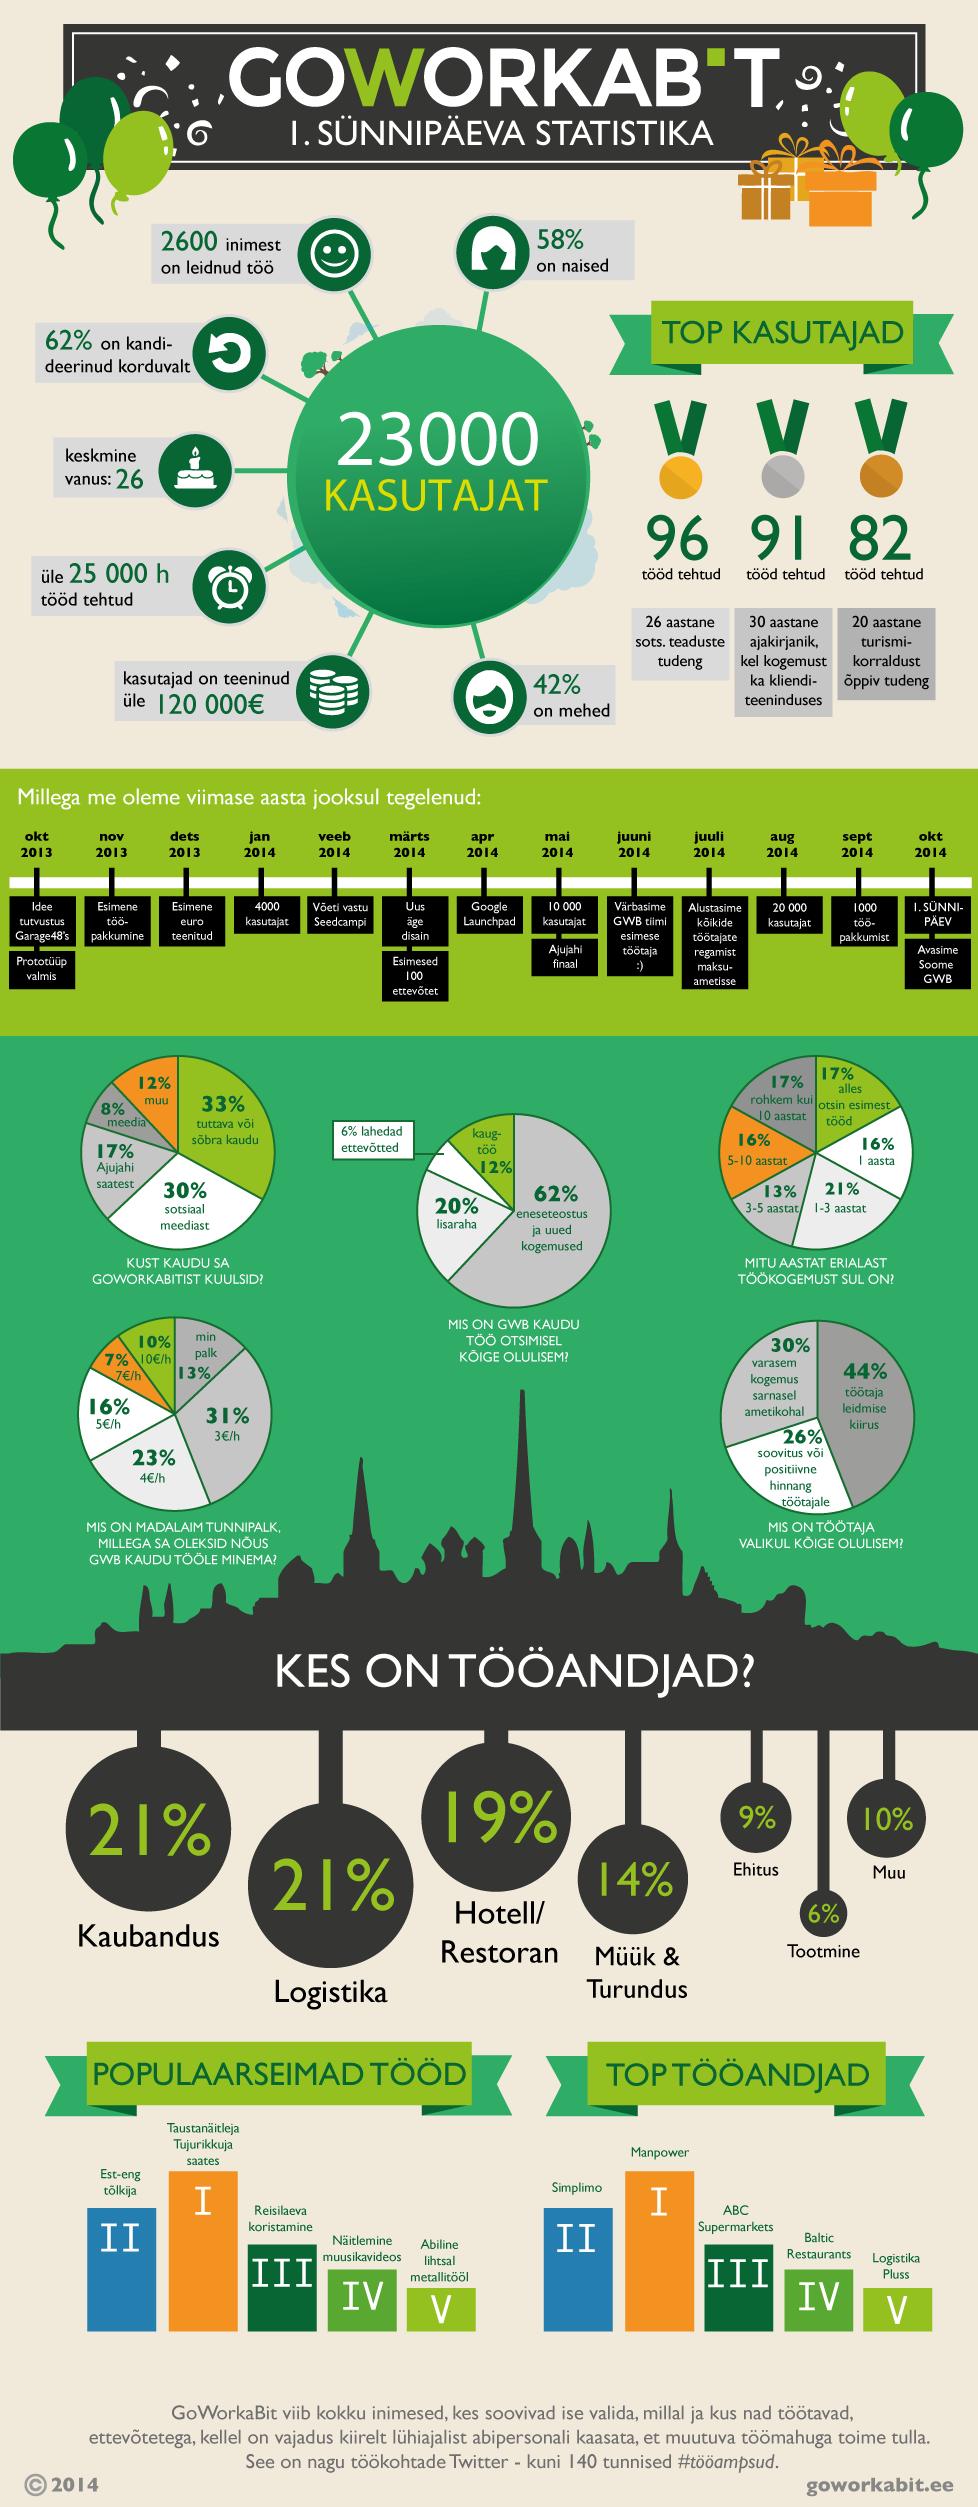 infographic_est_goworkabit